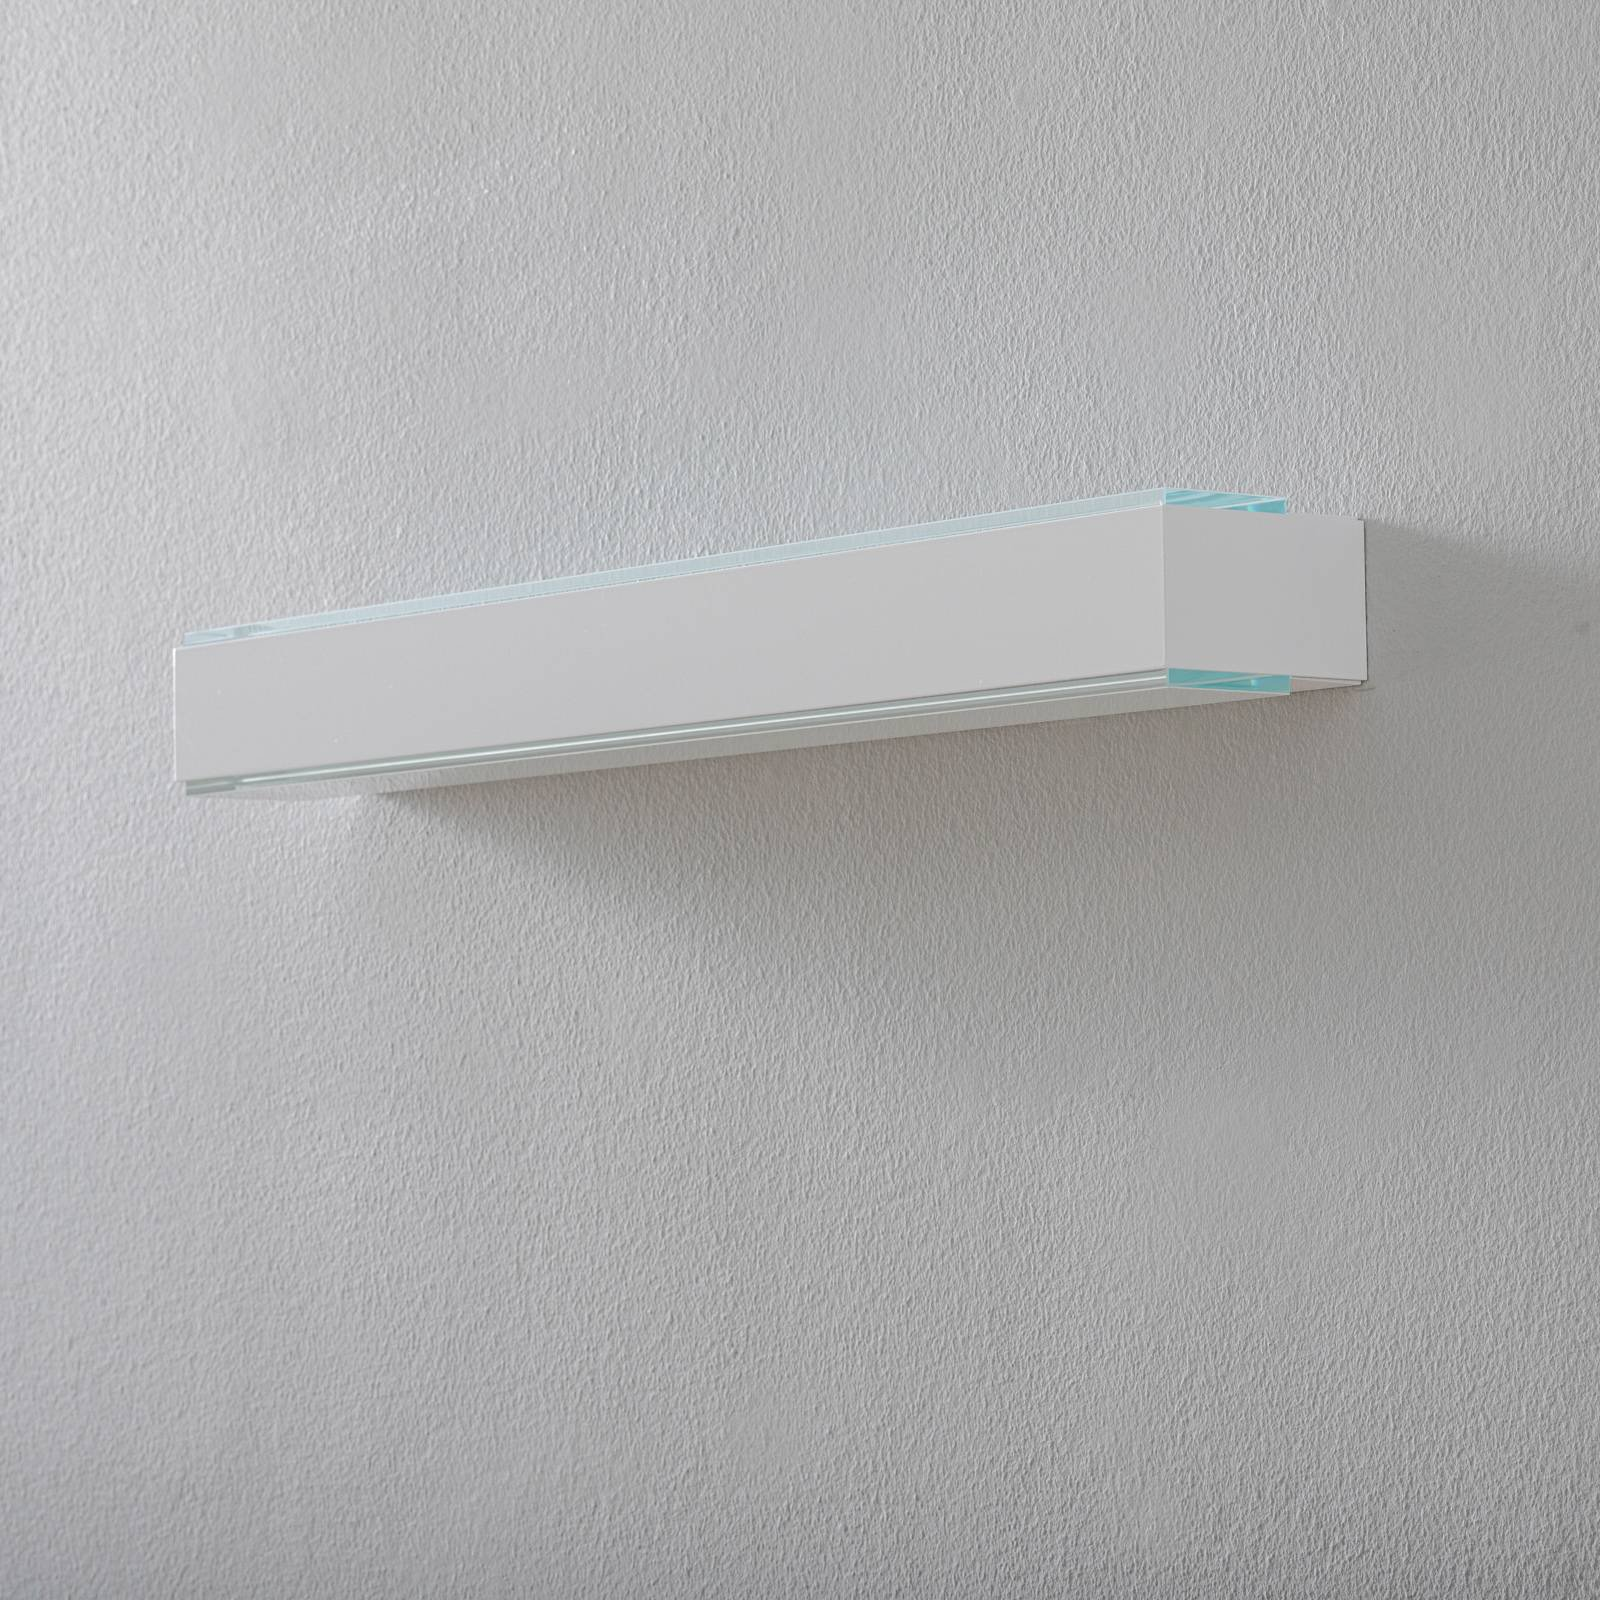 BEGA 78626 LED-vegglampe 3 000 K 60 cm hvit